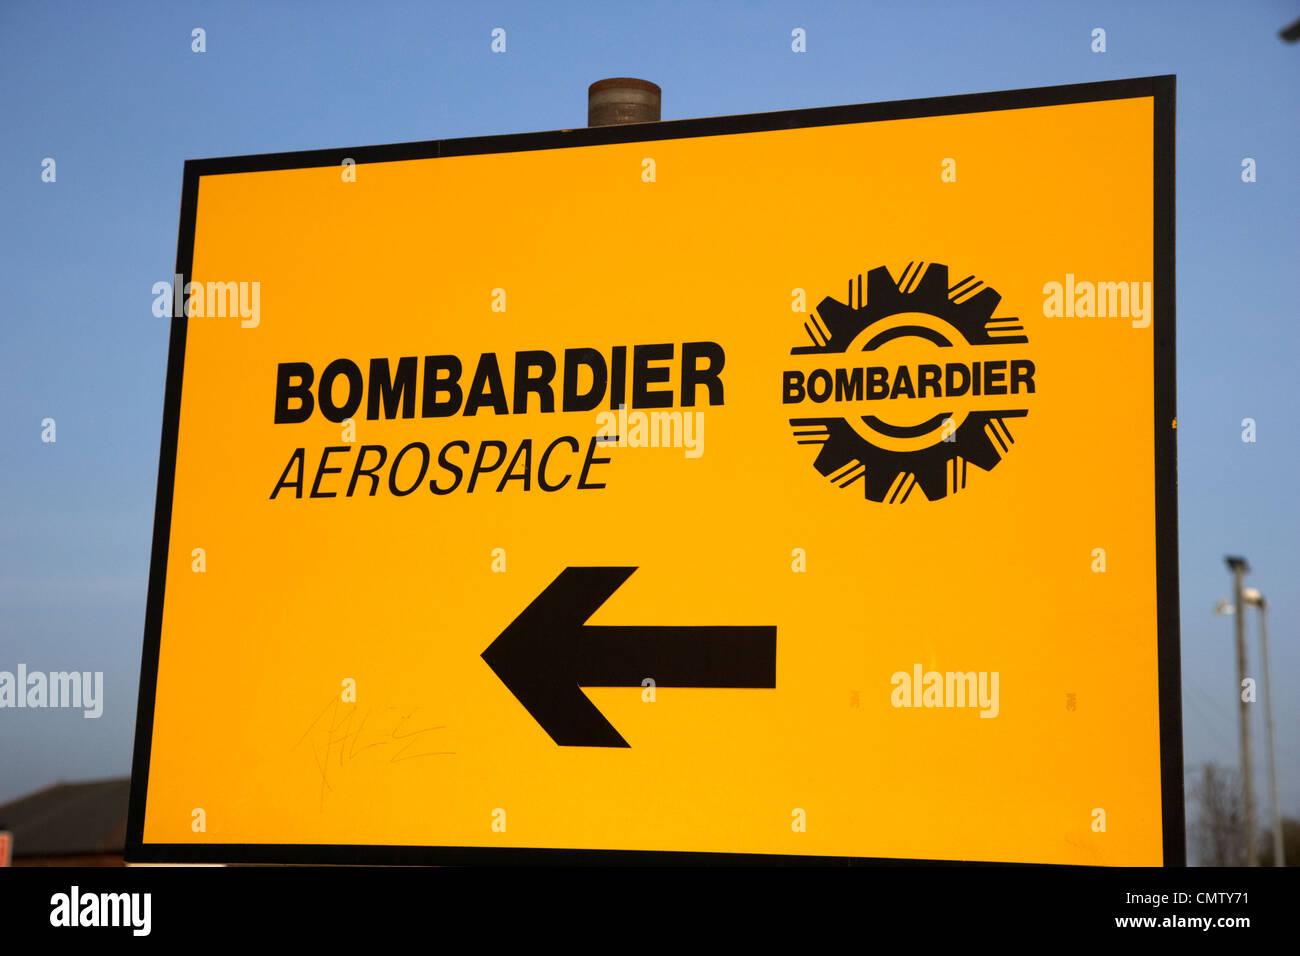 yellow road directions sign for bombardier aerospace belfast, northern ireland uk united kingdom - Stock Image